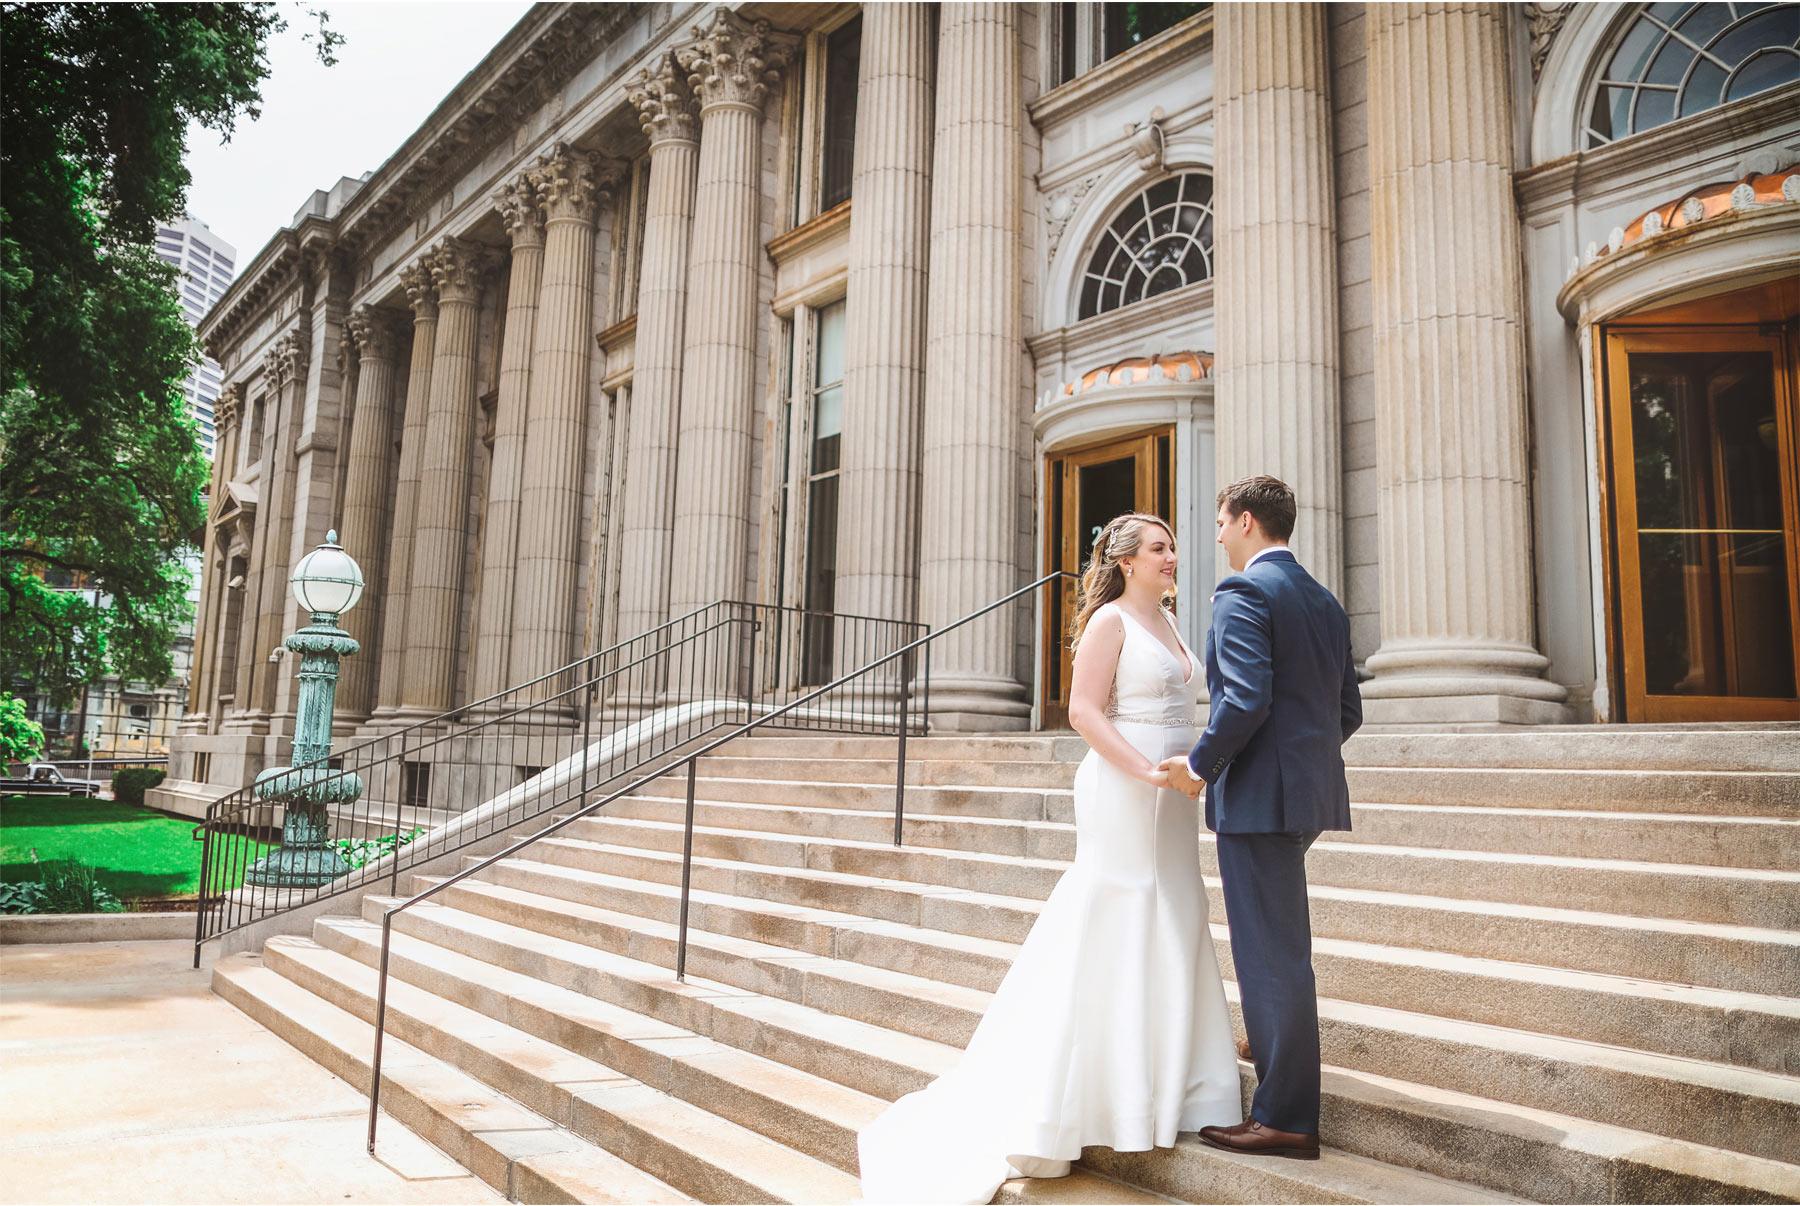 06-Minneapolis-Minnesota-Wedding-Vick-Photography-The-Depot-Bride-Groom-First-Look-Amelia-and-Alexander.jpg